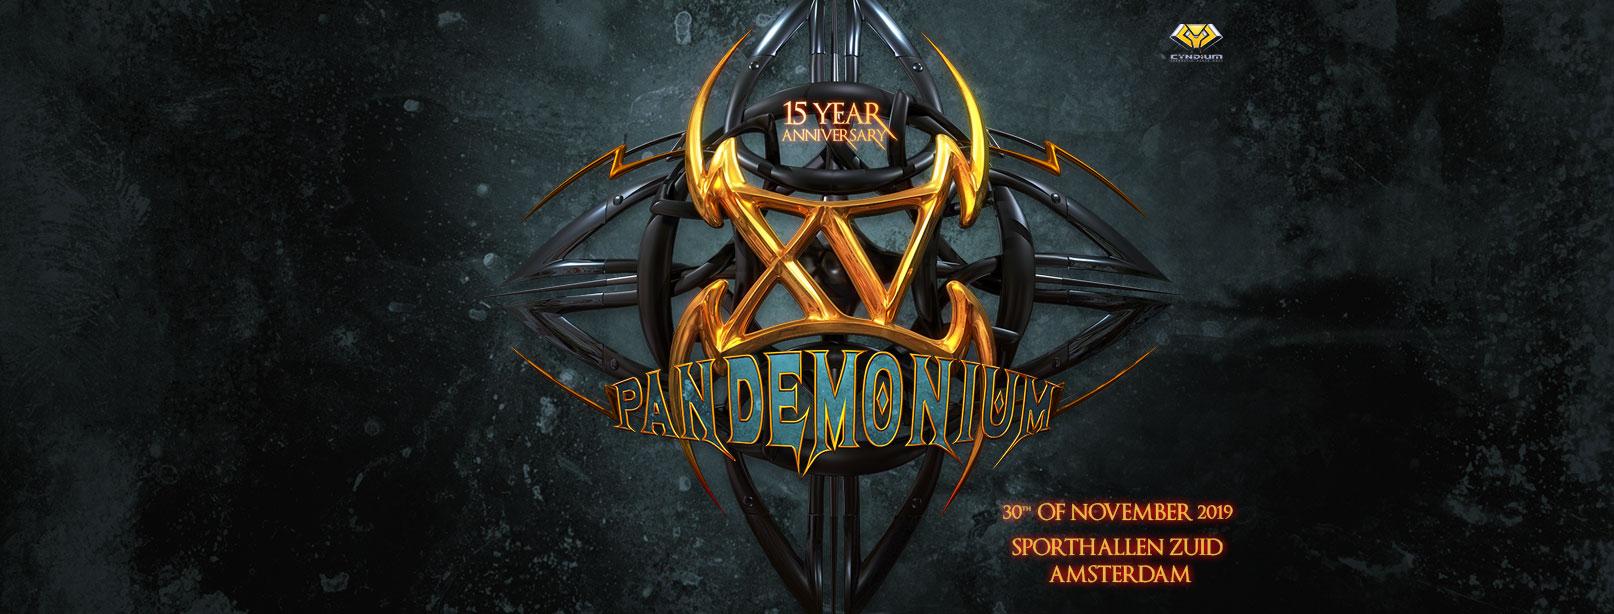 Pandemonium 2019